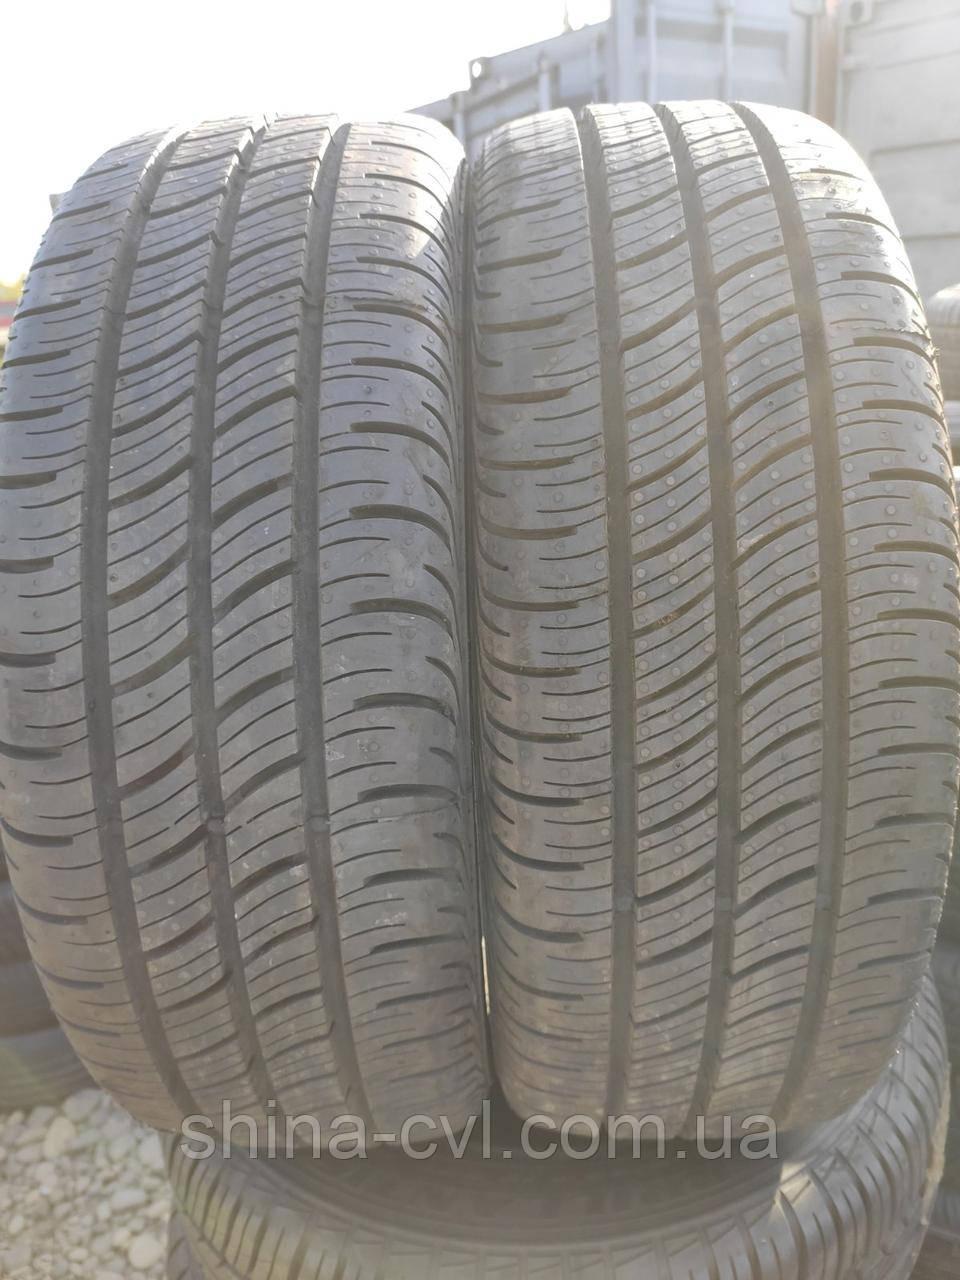 Літні шини 175/55 R15 77T CONTINENTAL CONTI PRO CONTACT